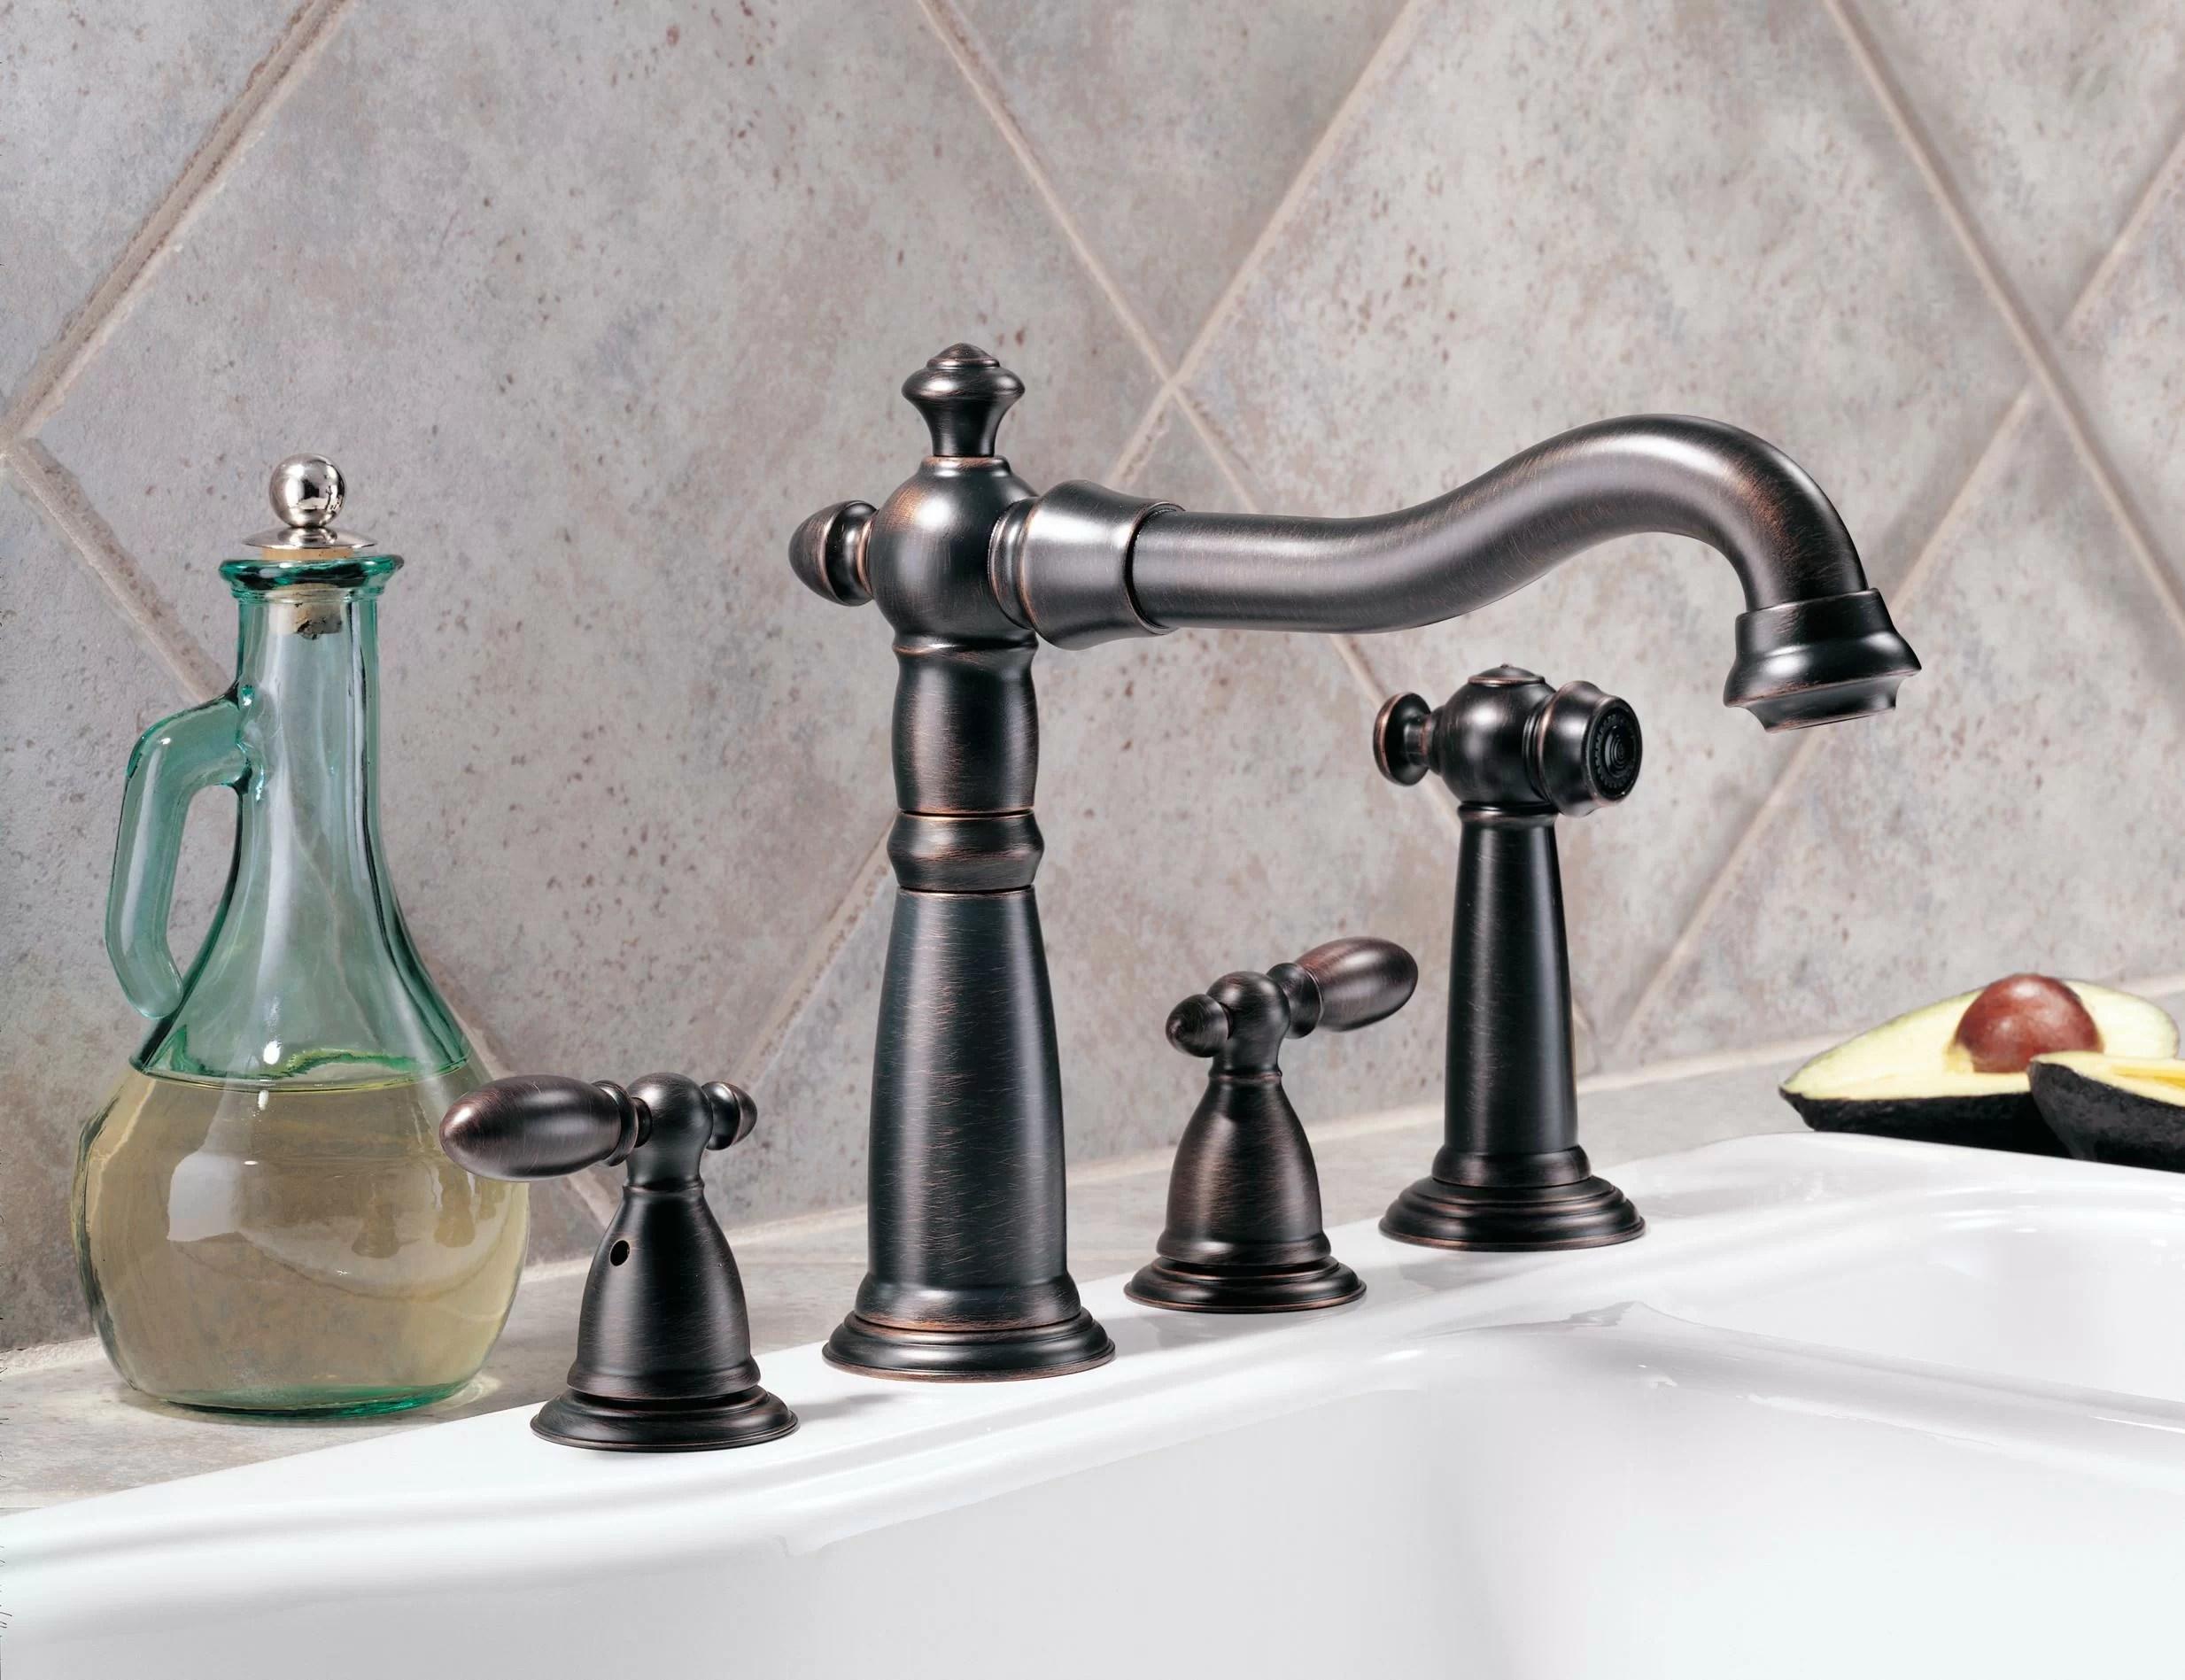 venetian bronze kitchen faucets you ll love in 2021 wayfair